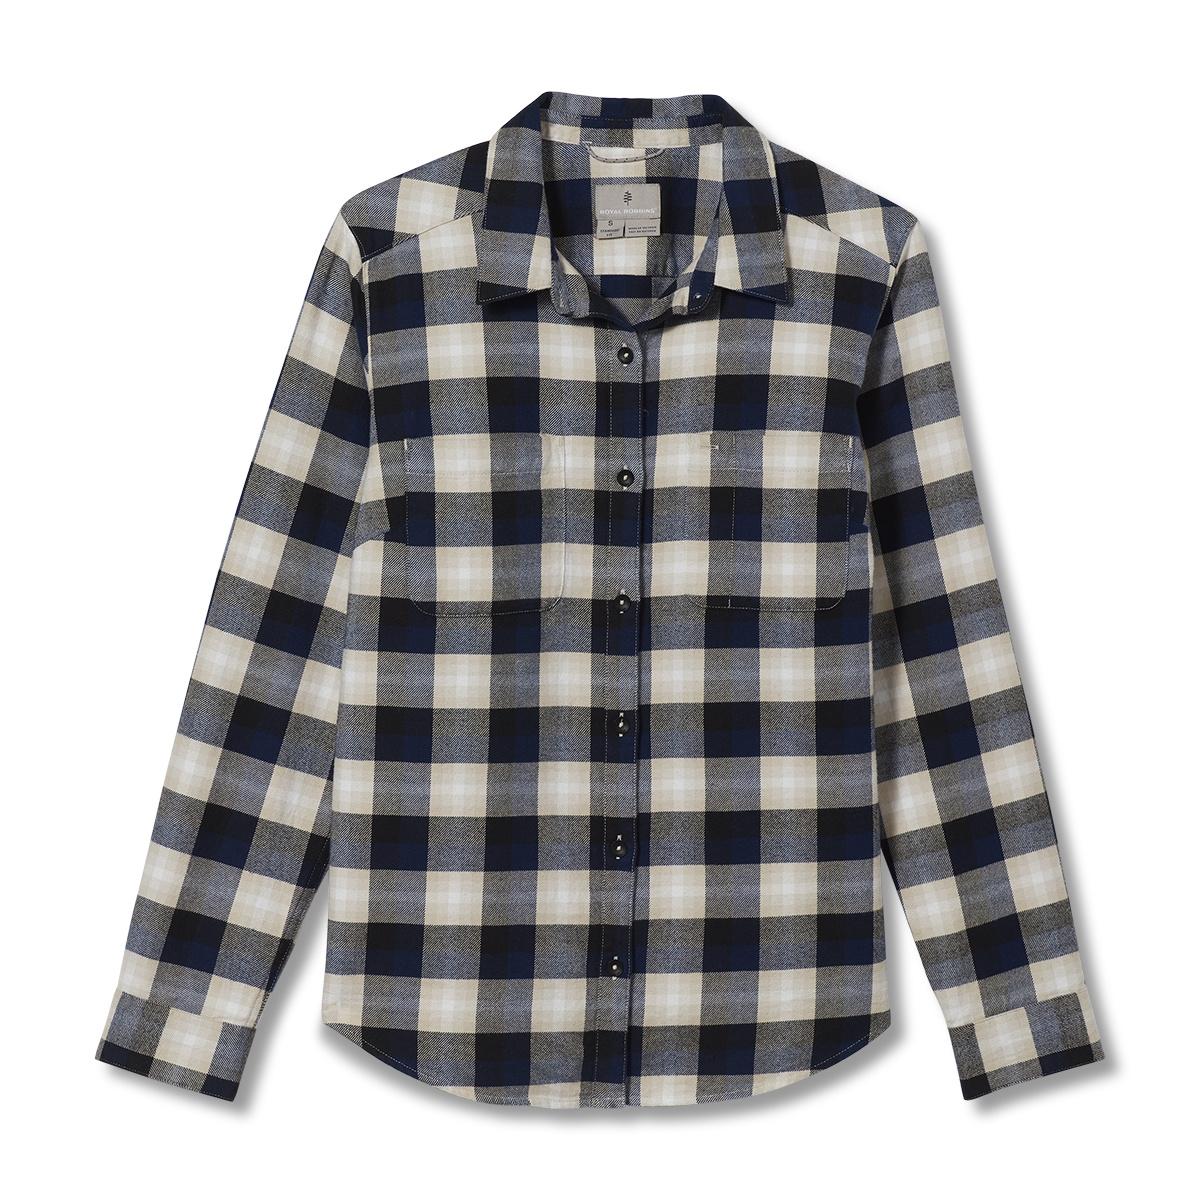 Lieback Organic Cotton Flannel LS, Creme